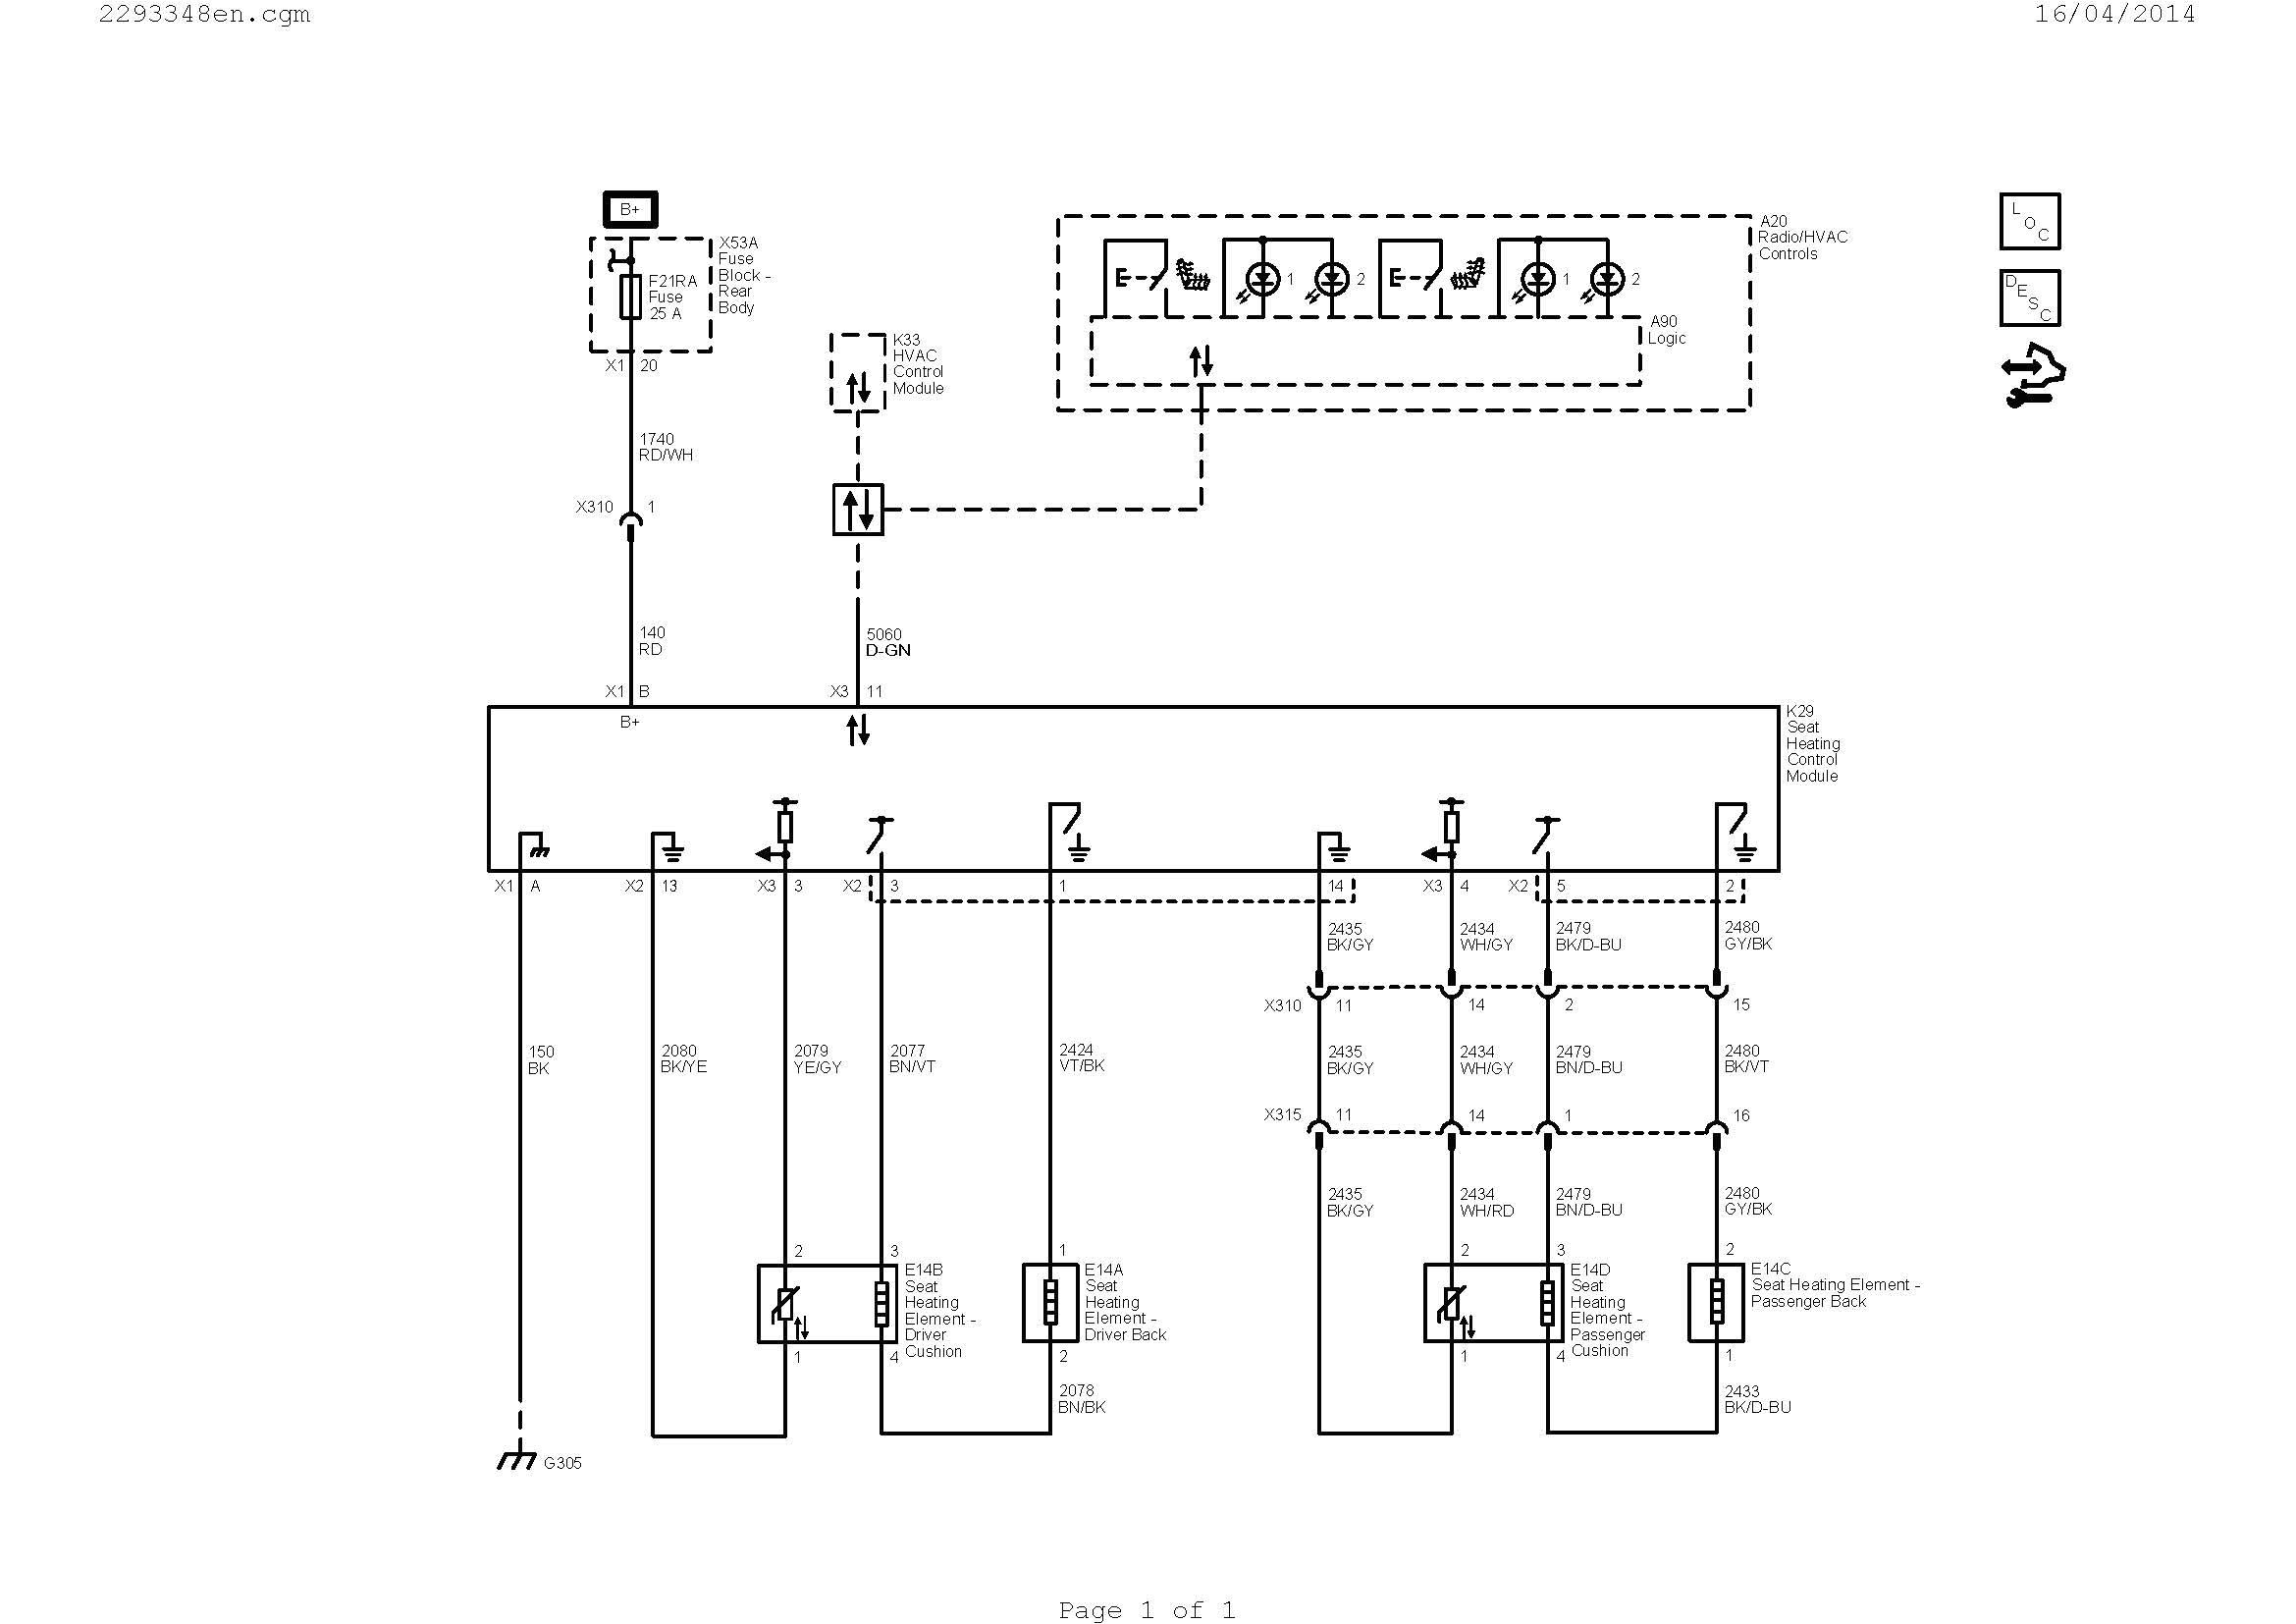 durant wiring diagram wiring diagram repair guides morgan olson wiring diagrams